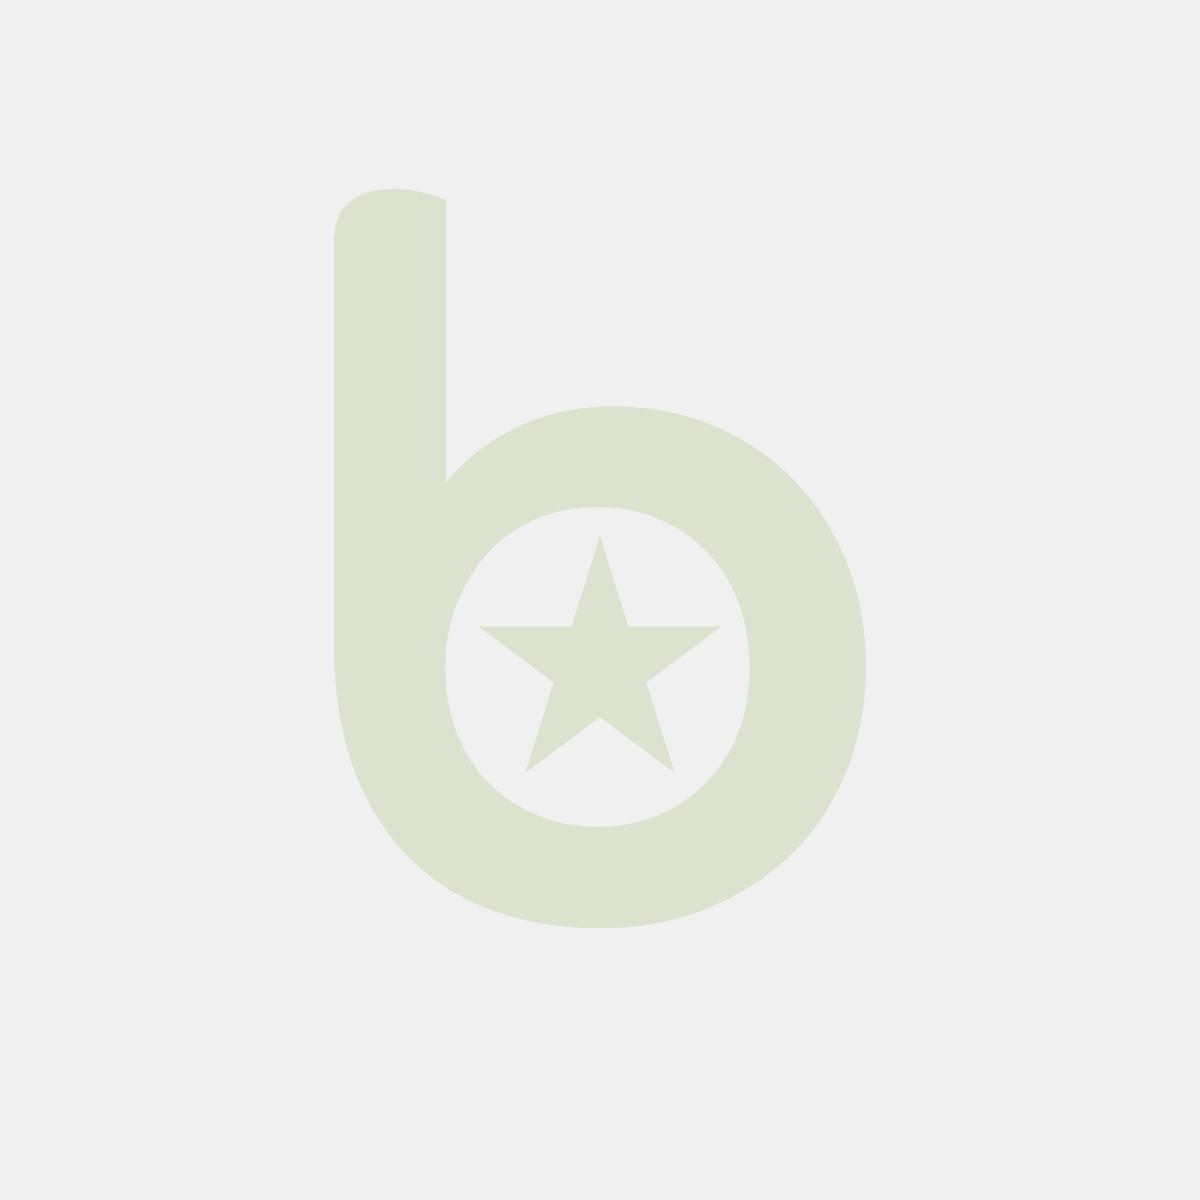 Pojemnik GN 1/4 Profi Line z polipropylenu